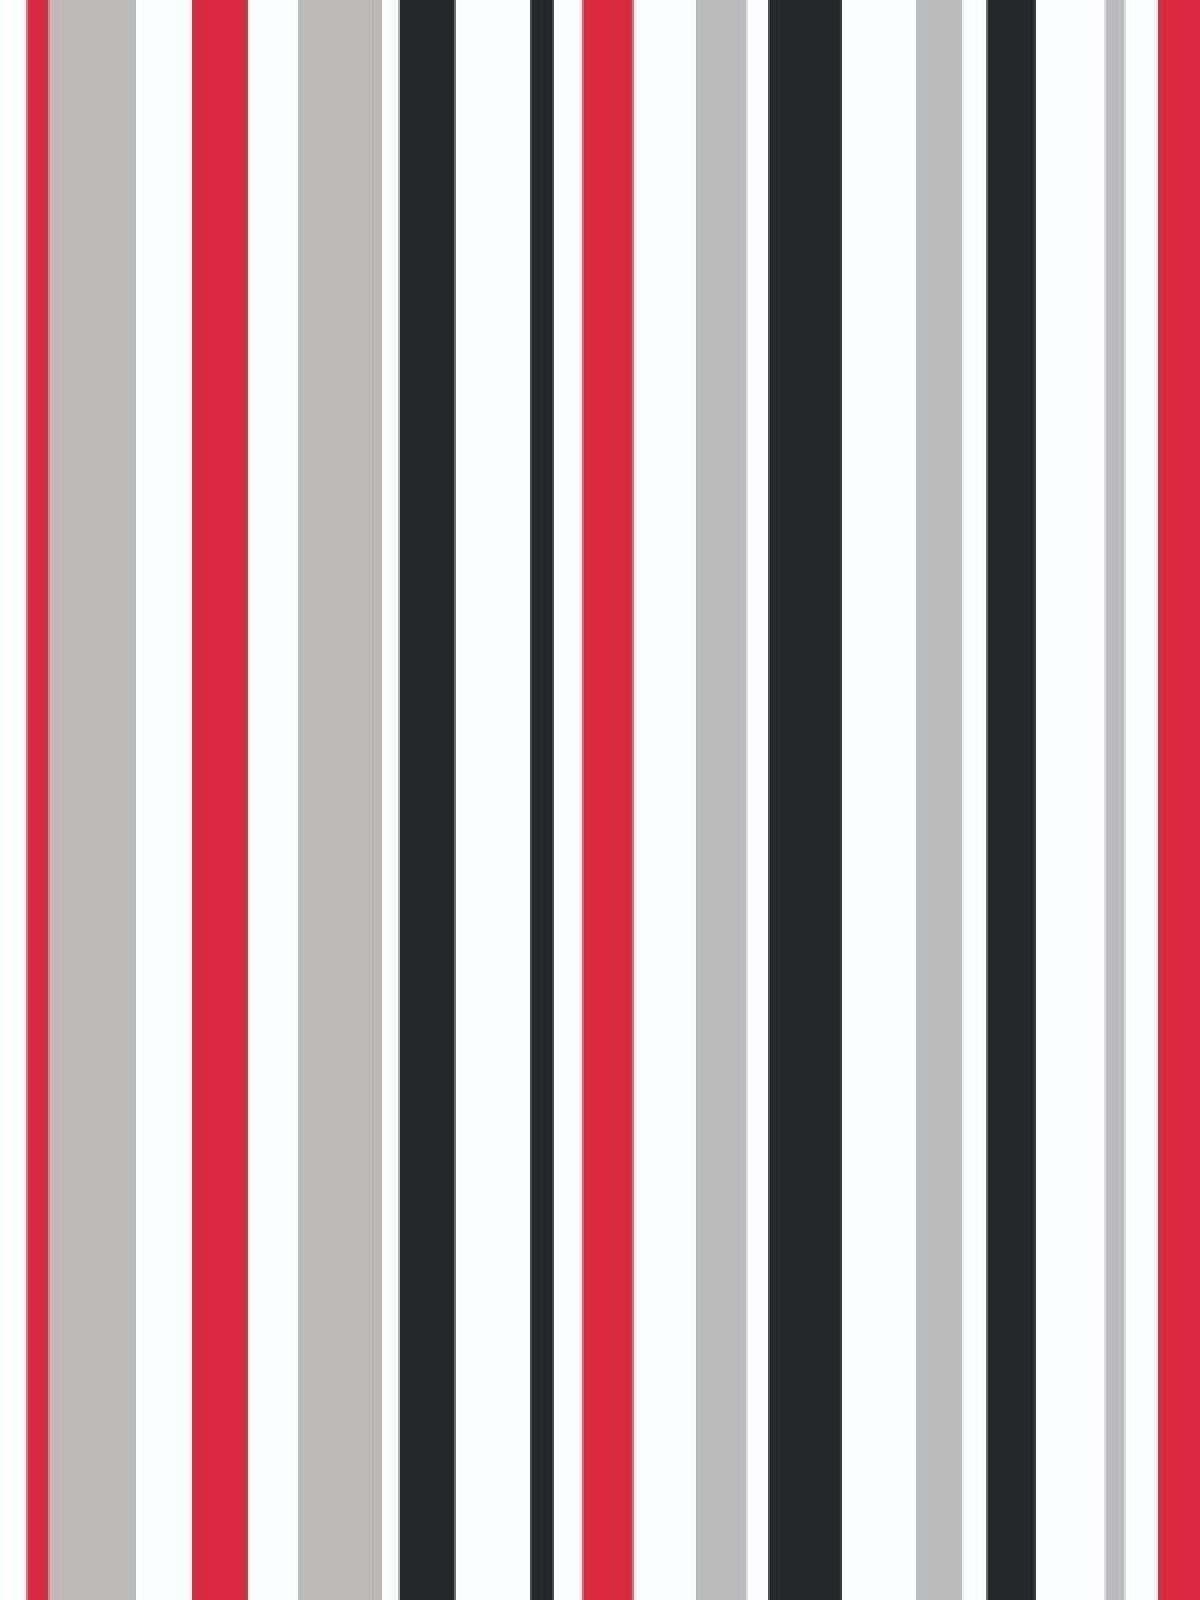 15 Grey Wallpaper Stripe Background Striped Wallpaper Red Wallpaper Striped Wallpaper Hd